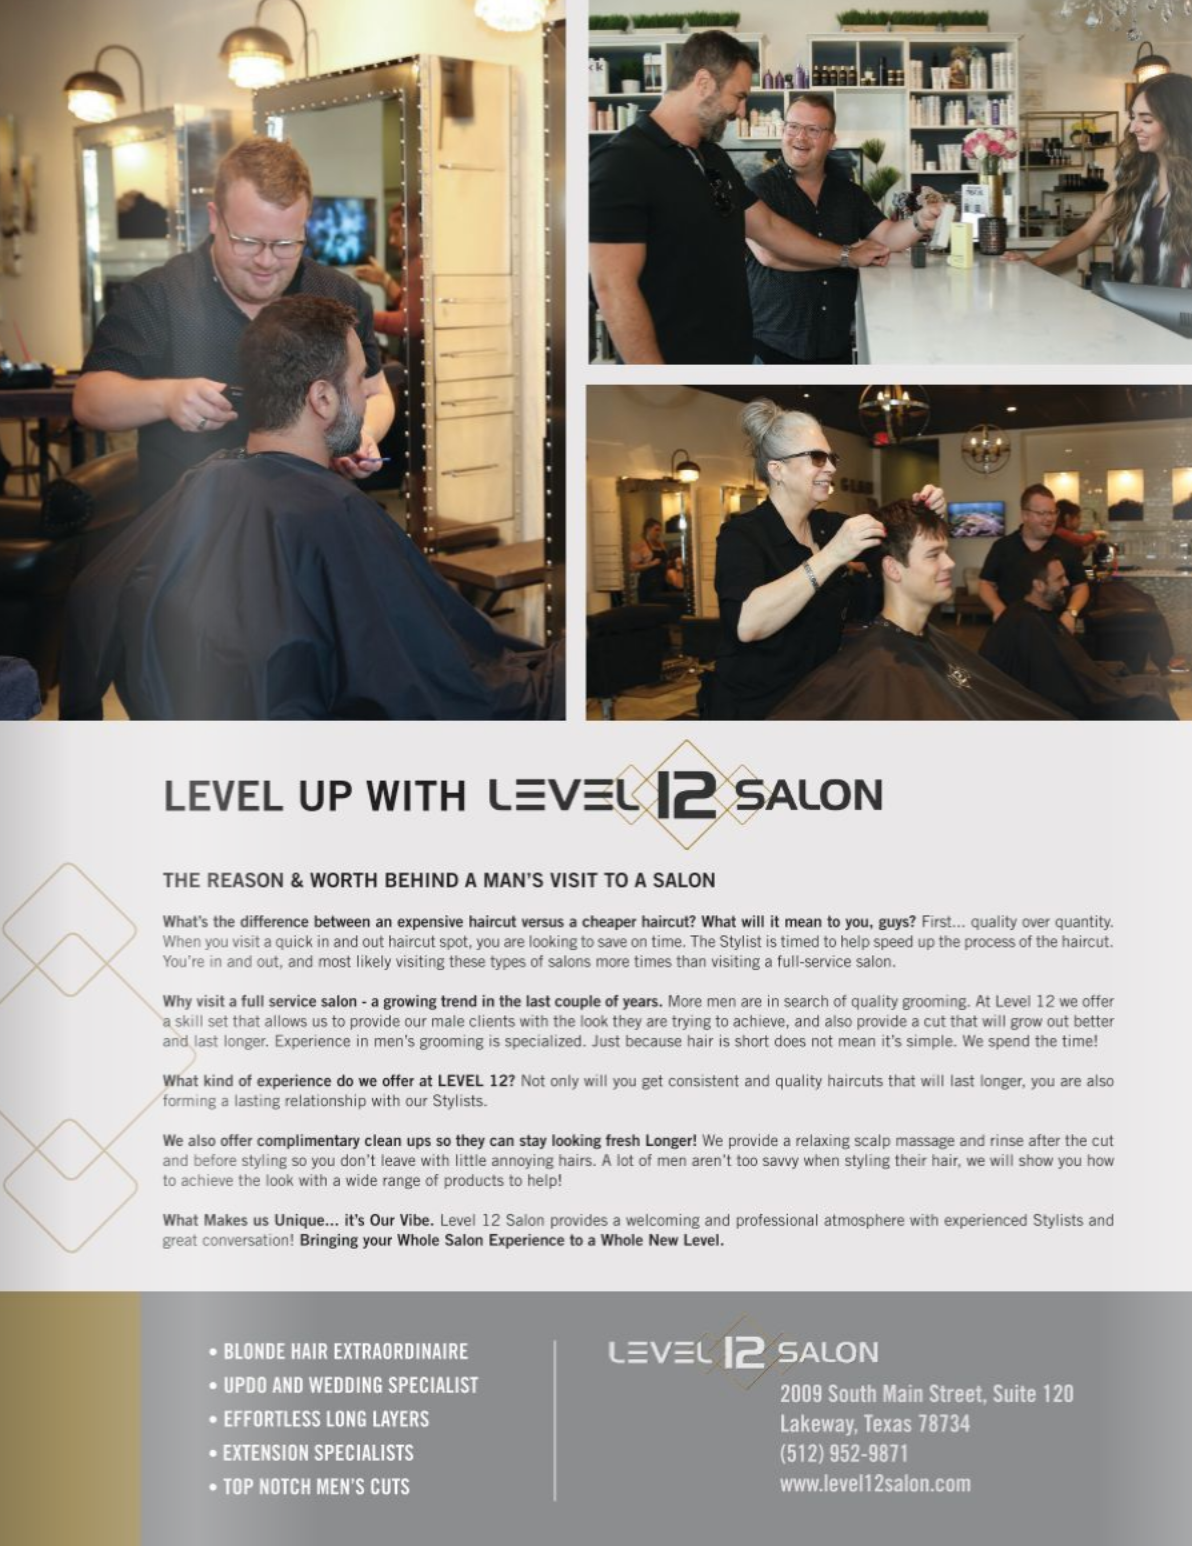 Level Up with Level 12 - Level 12 Salon in Waterways Magazine